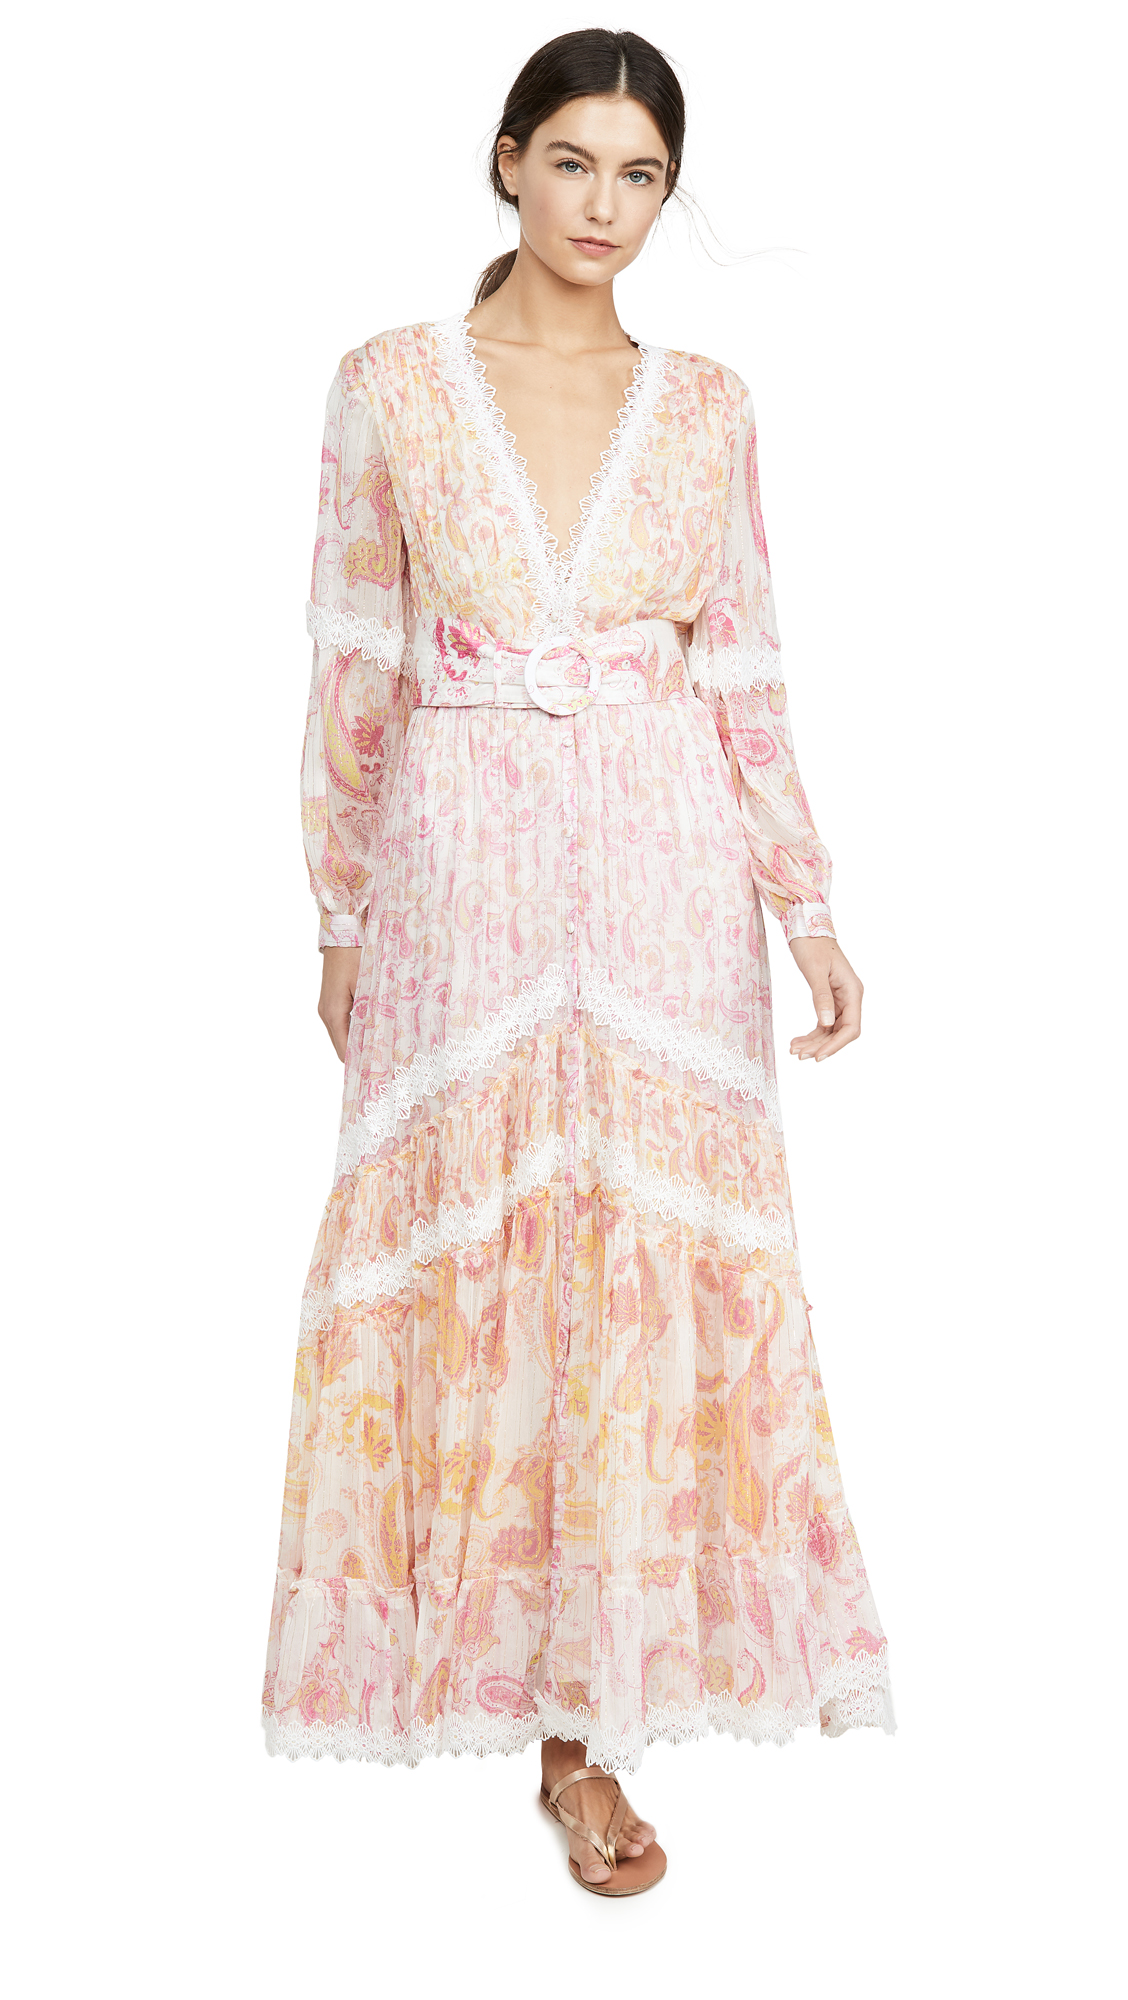 ROCOCO SAND V Neck Long Dress